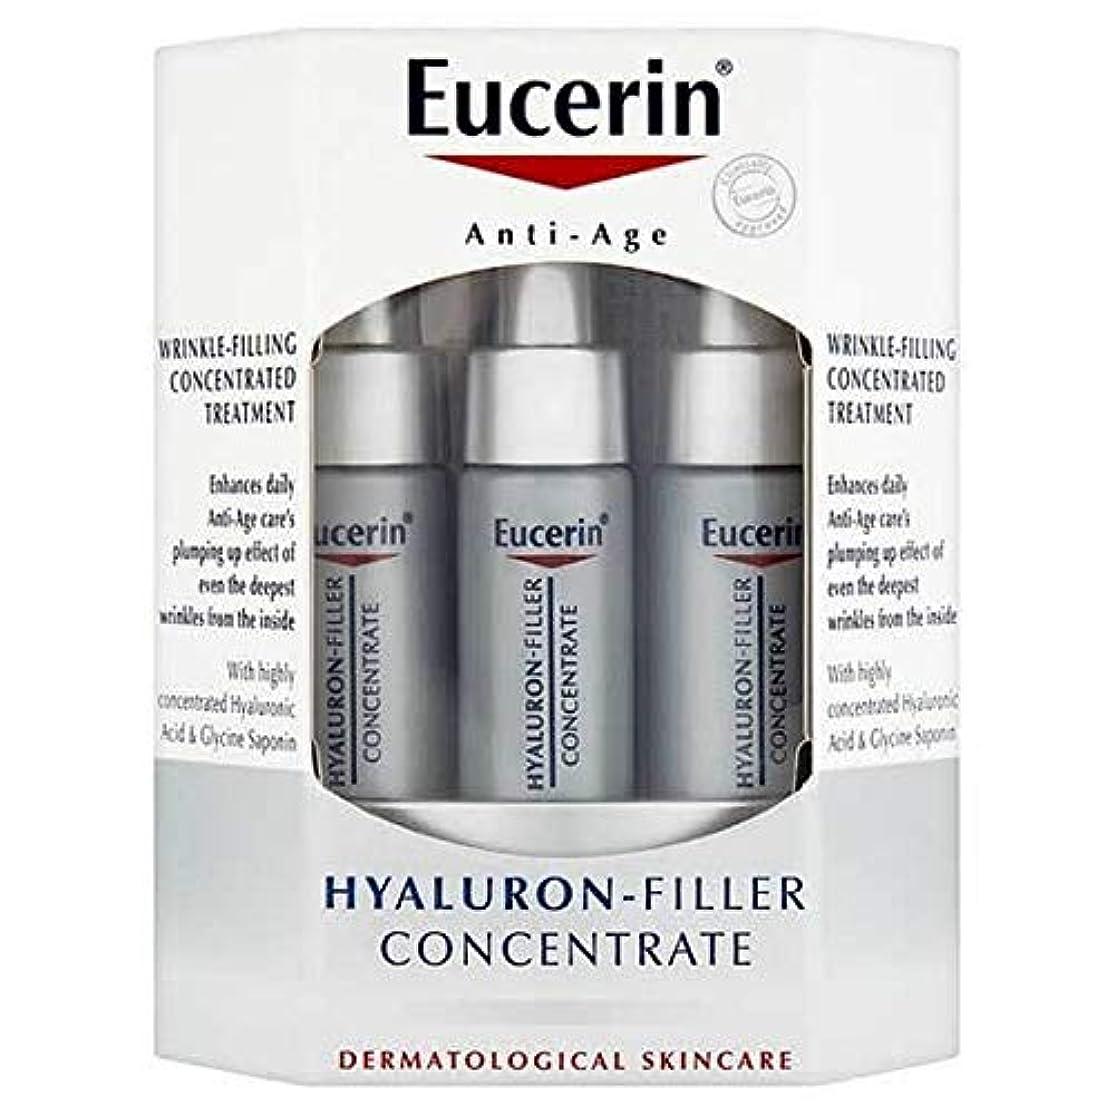 [Eucerin ] ユーセリンヒアルロンフィラー濃縮6X65Ml - Eucerin Hyaluron Filler Concentrate 6x65ml [並行輸入品]